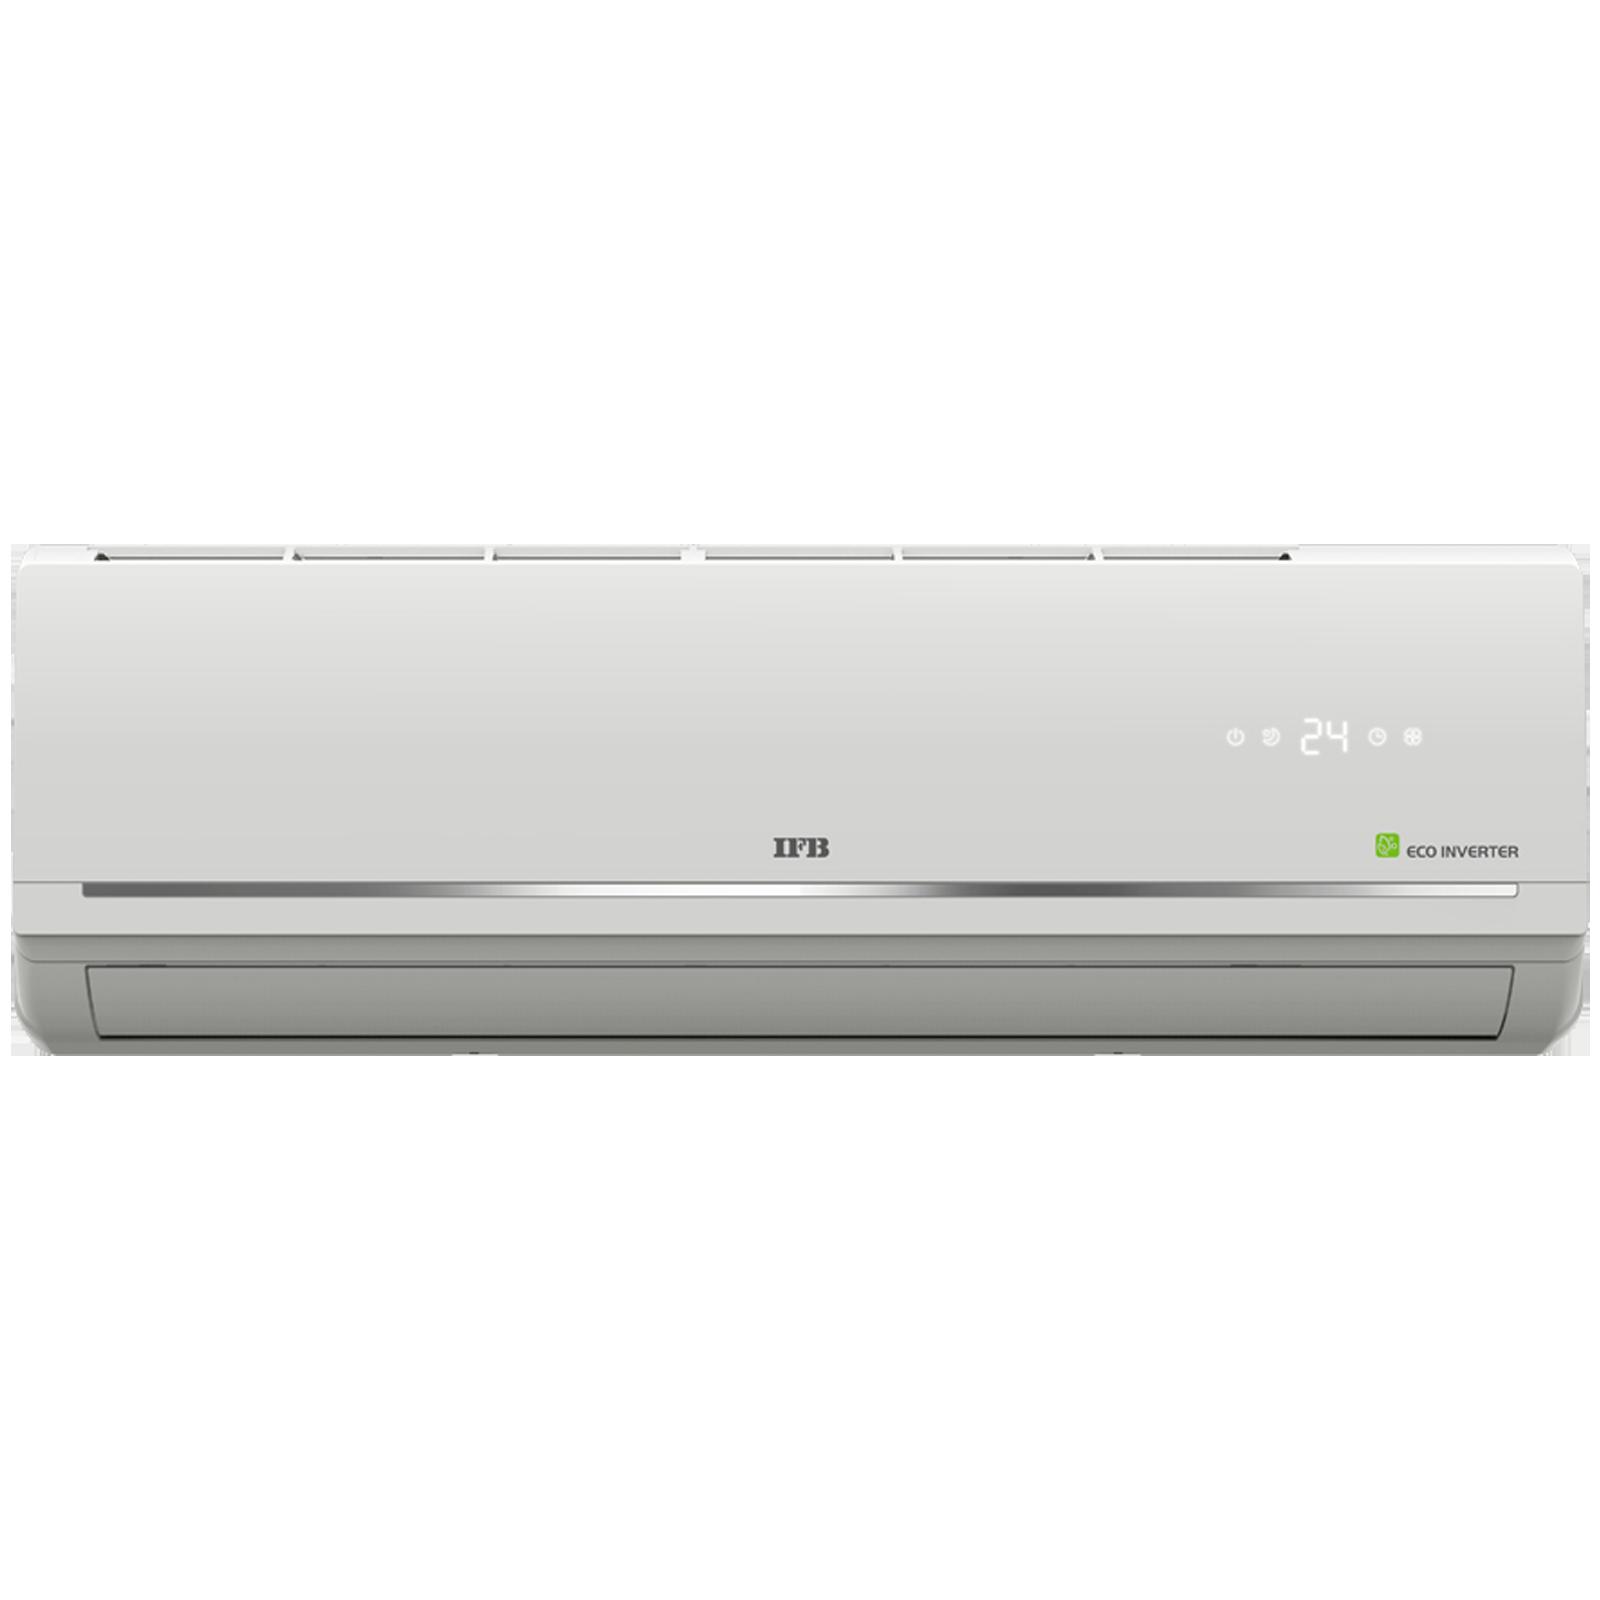 IFB Key Accounts 1.5 Ton 3 Star Inverter Split AC (Copper Condenser, IACI18BD3G3C, White)_1